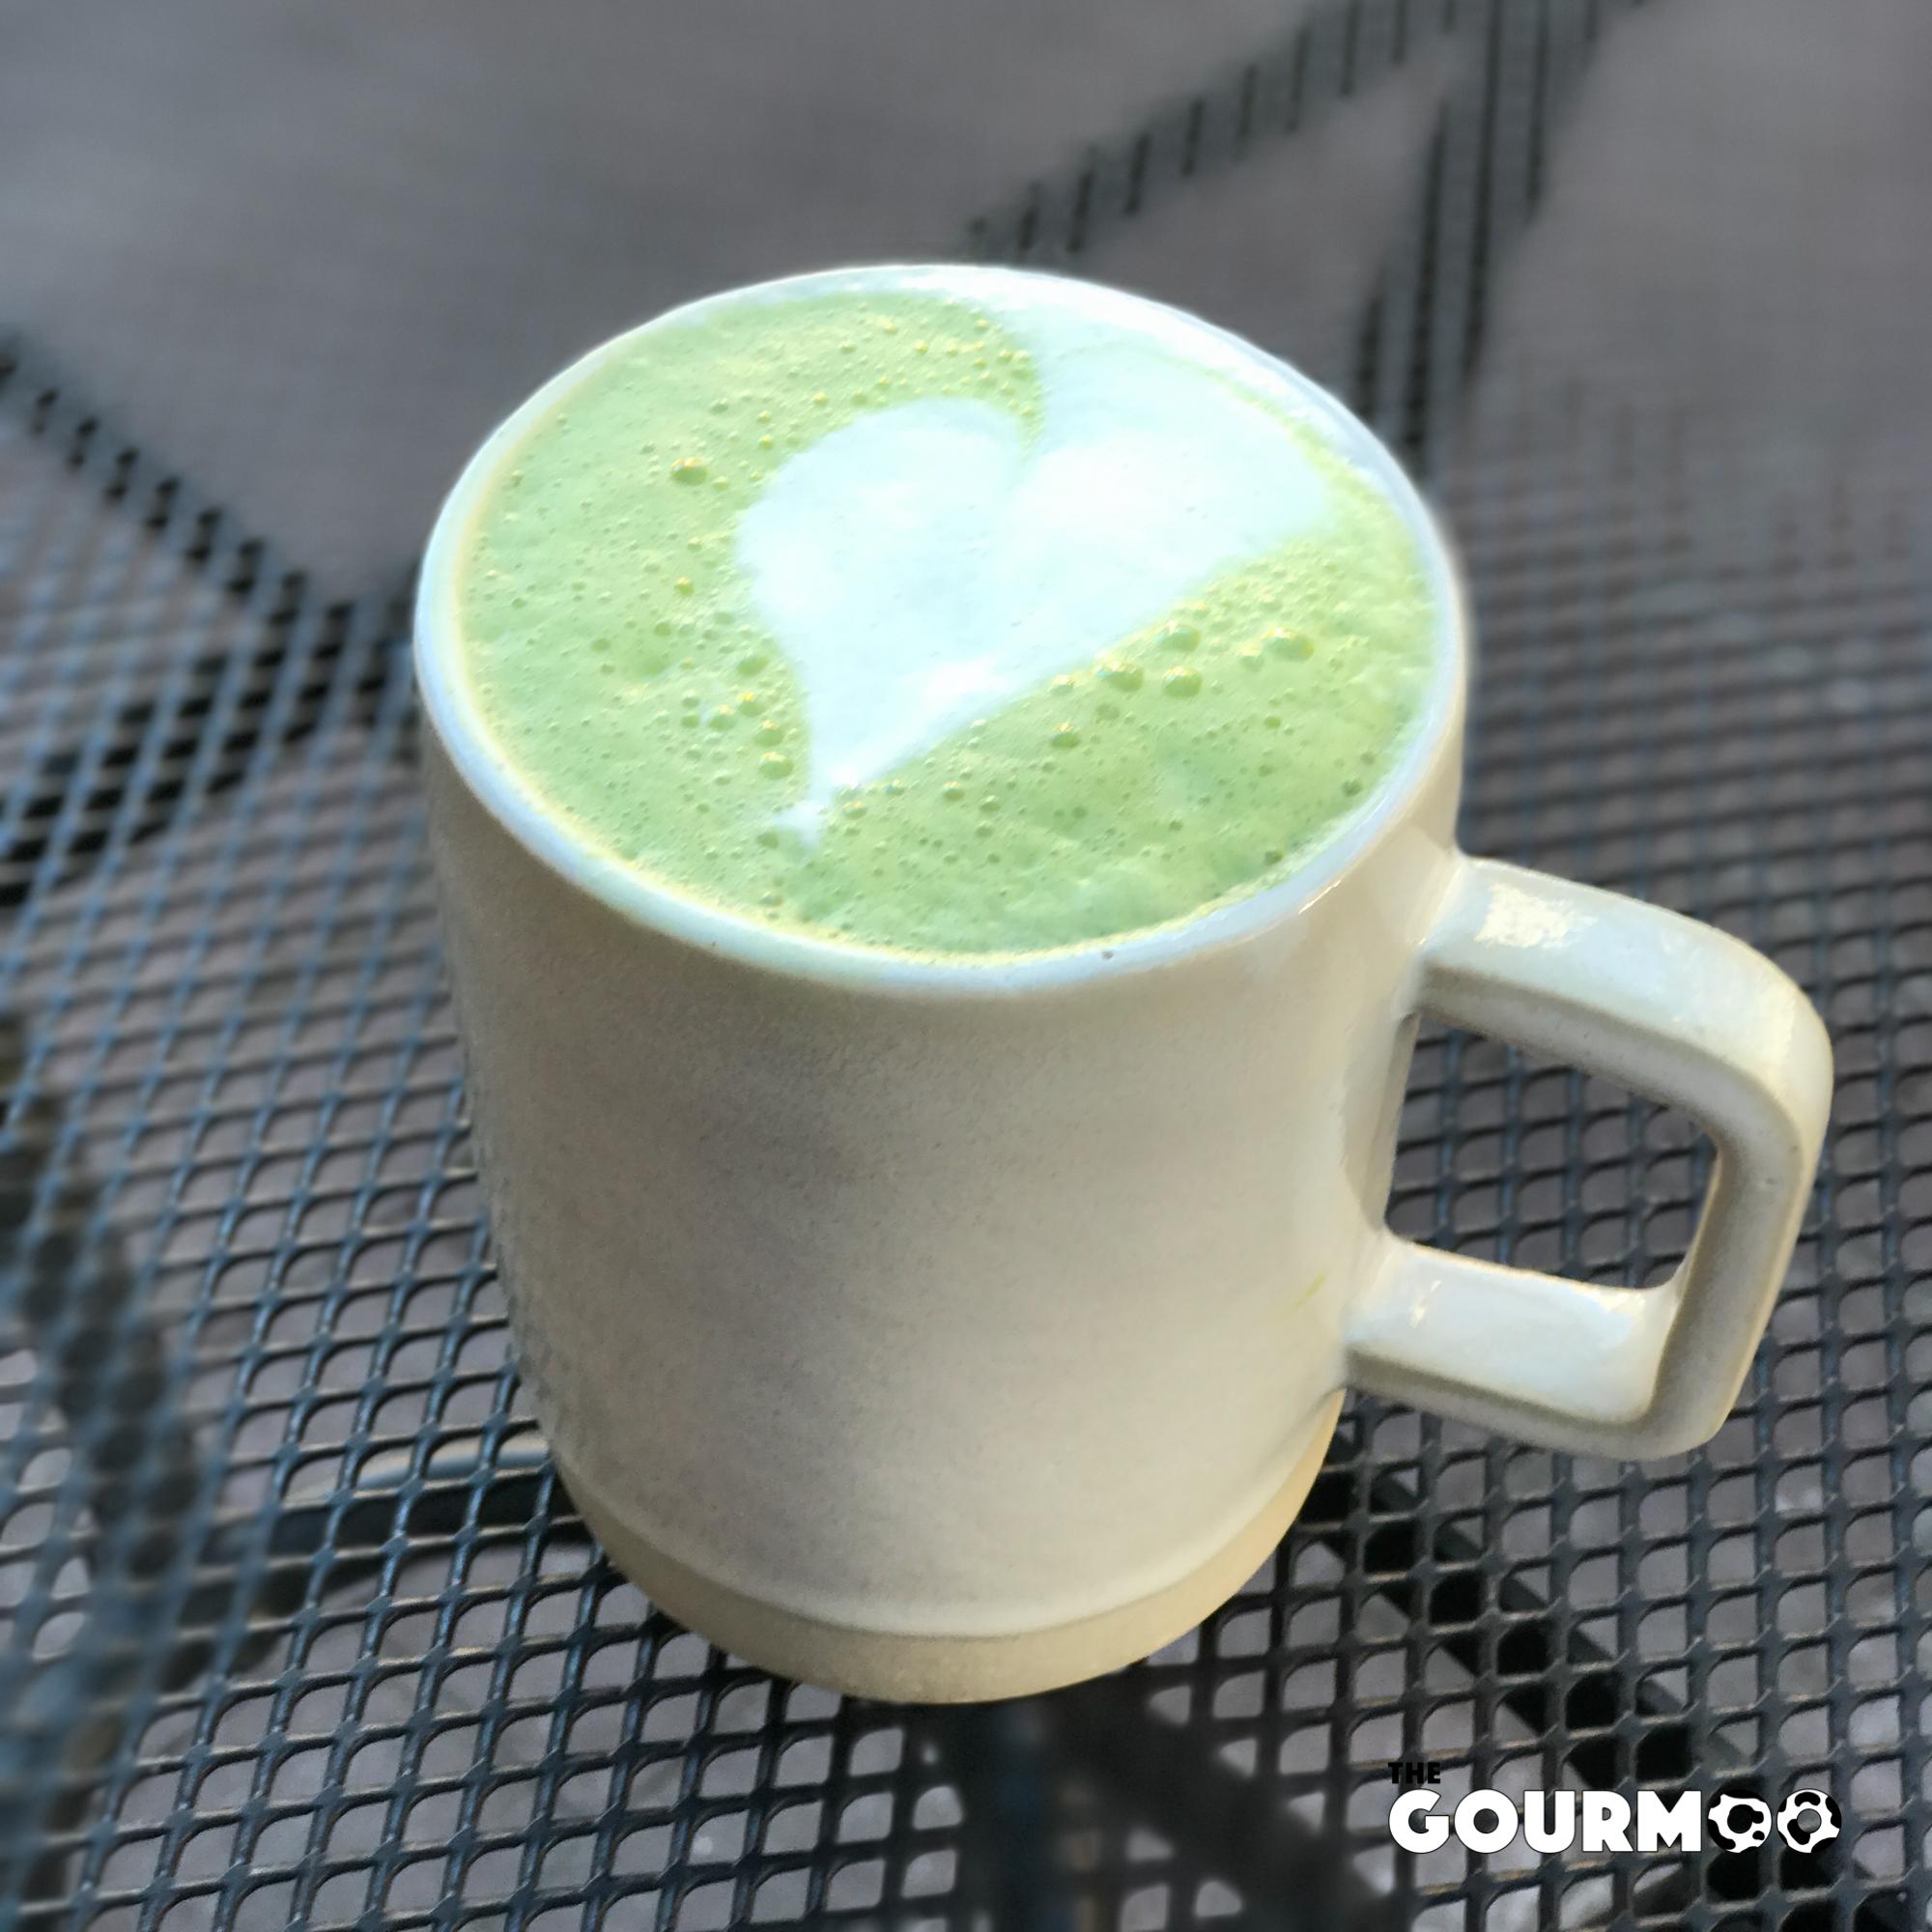 Gourmoo blog (1 of 7).jpg